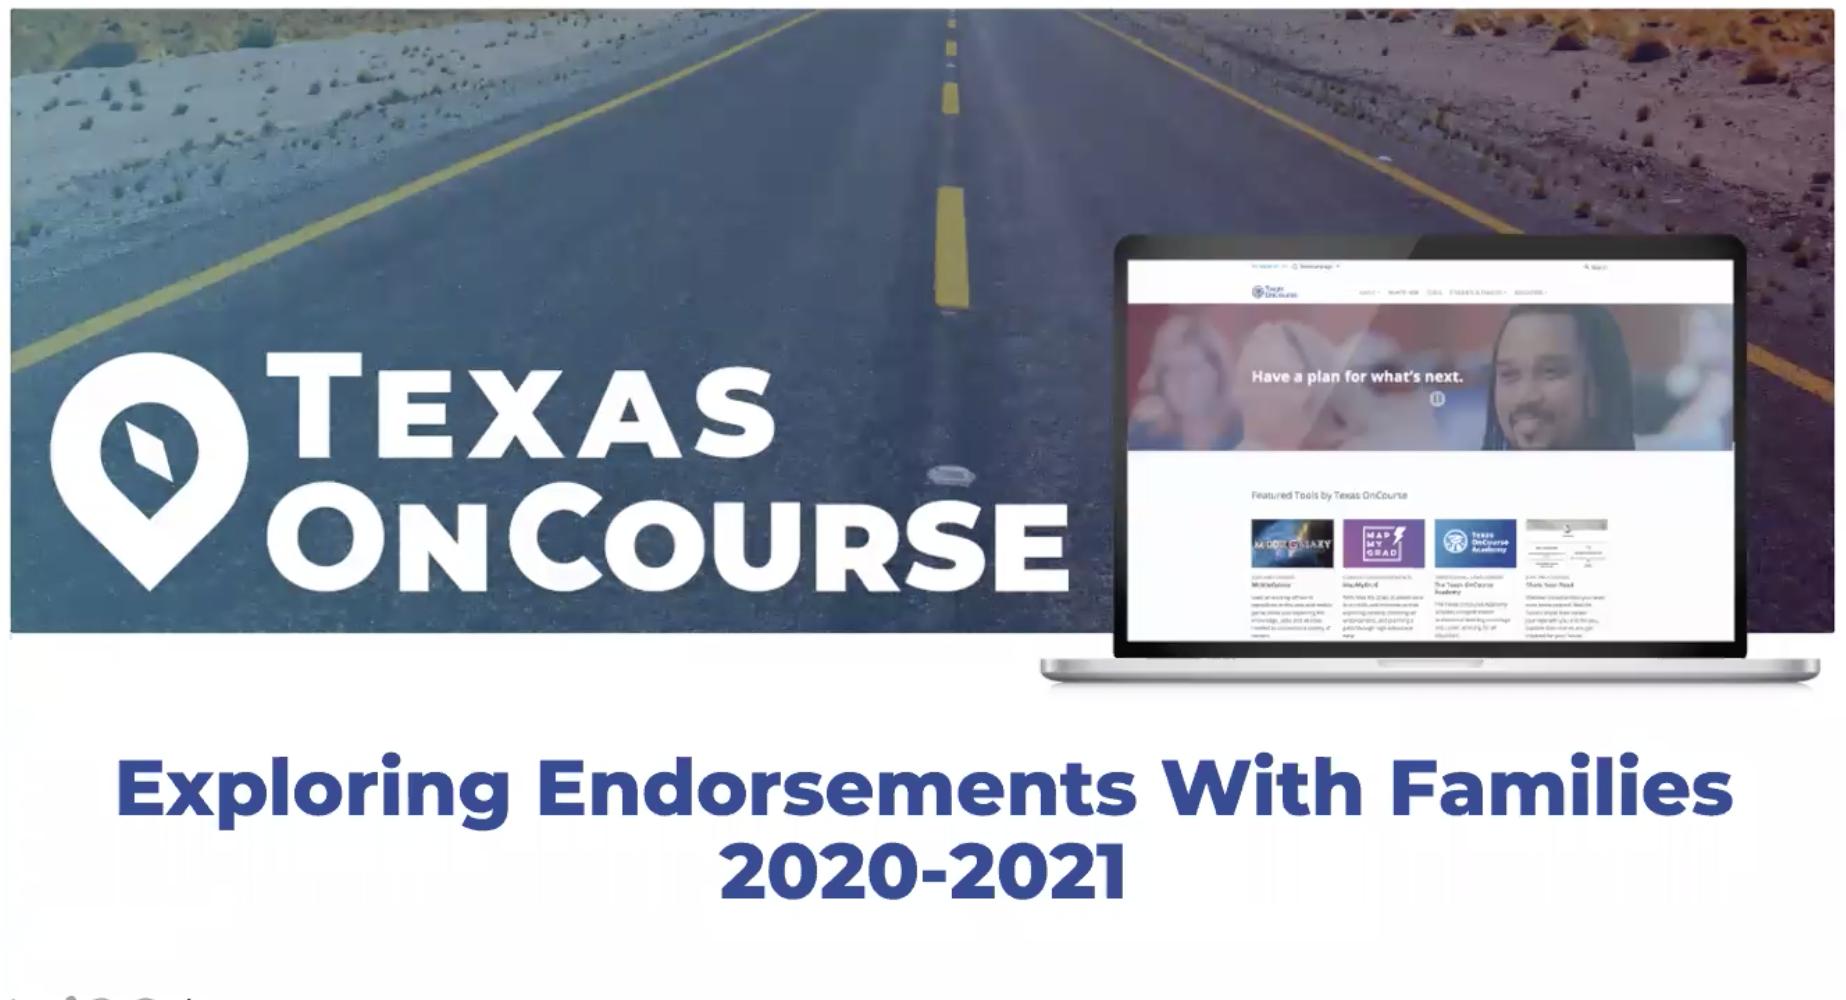 Exploring Endorsements with Families 2020-2021